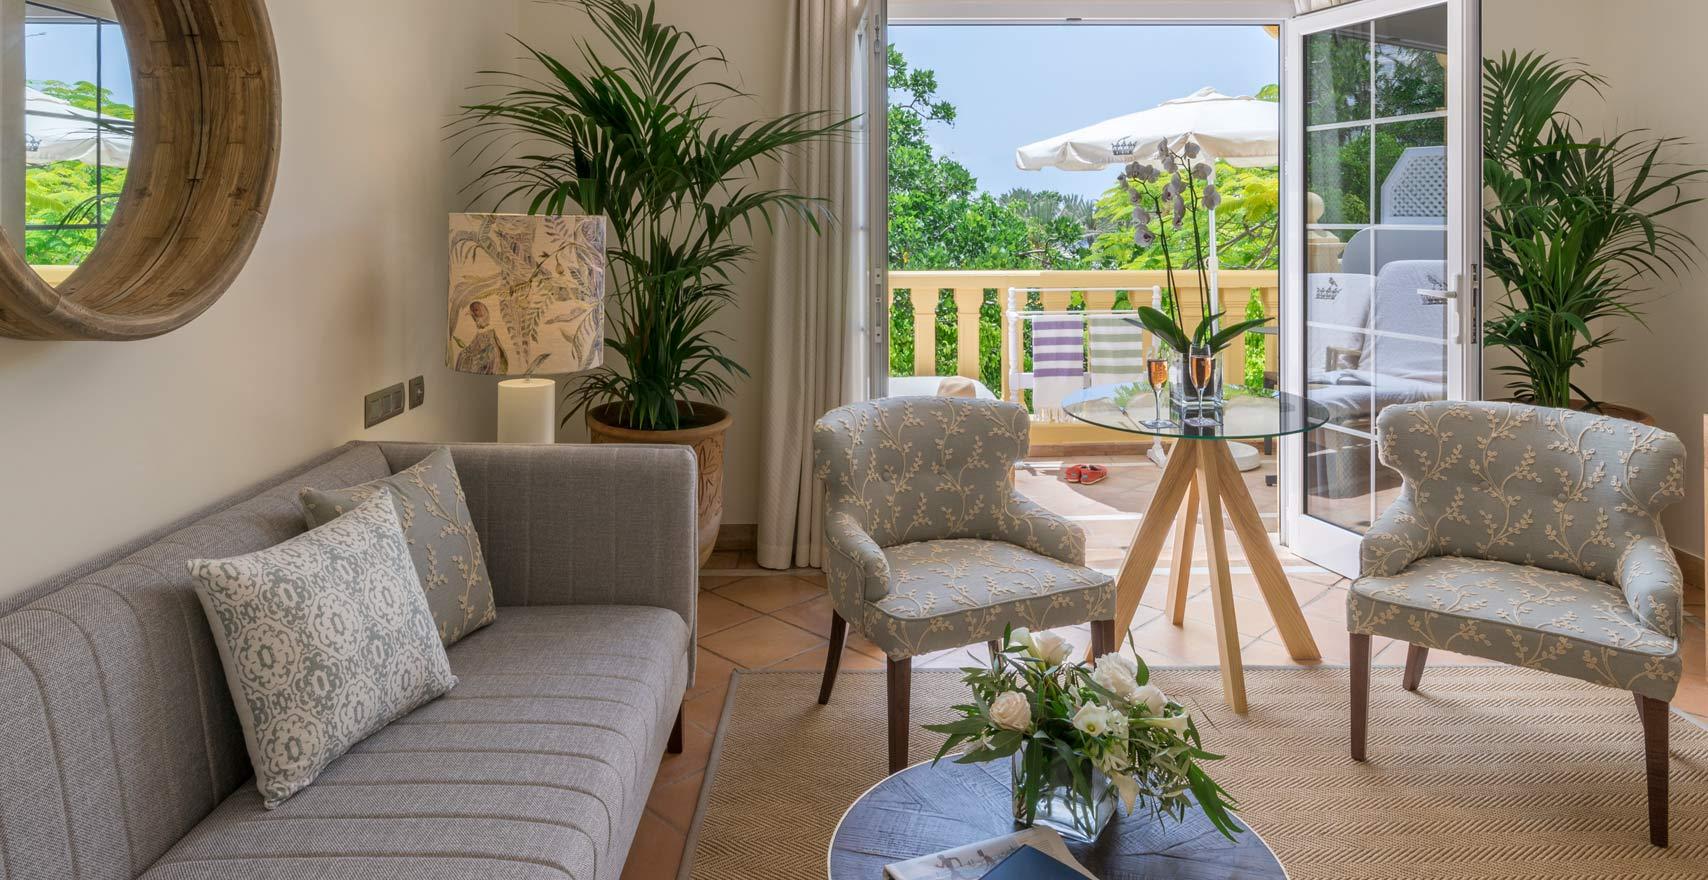 Suite Casas Ducales living room